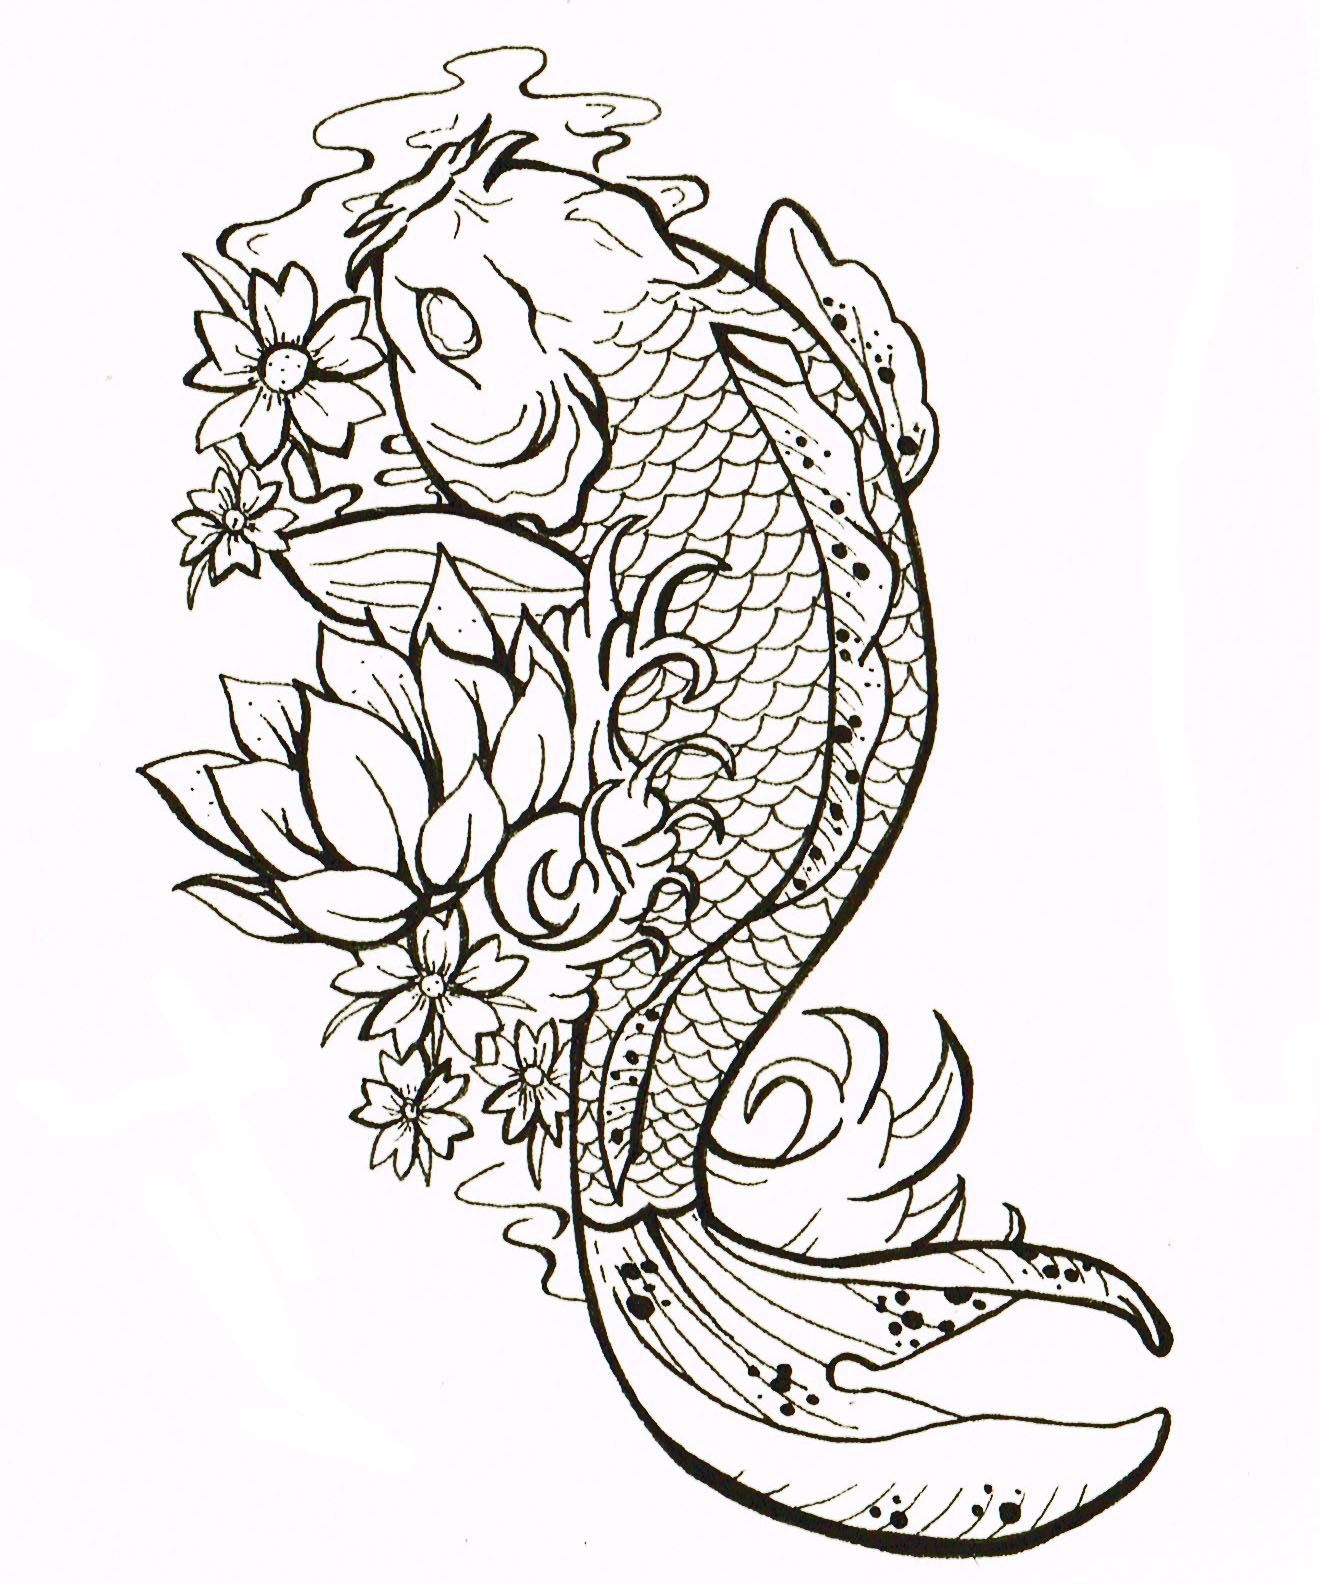 Koi carp drawing 1320 1585 carp orname for Koi fish designs